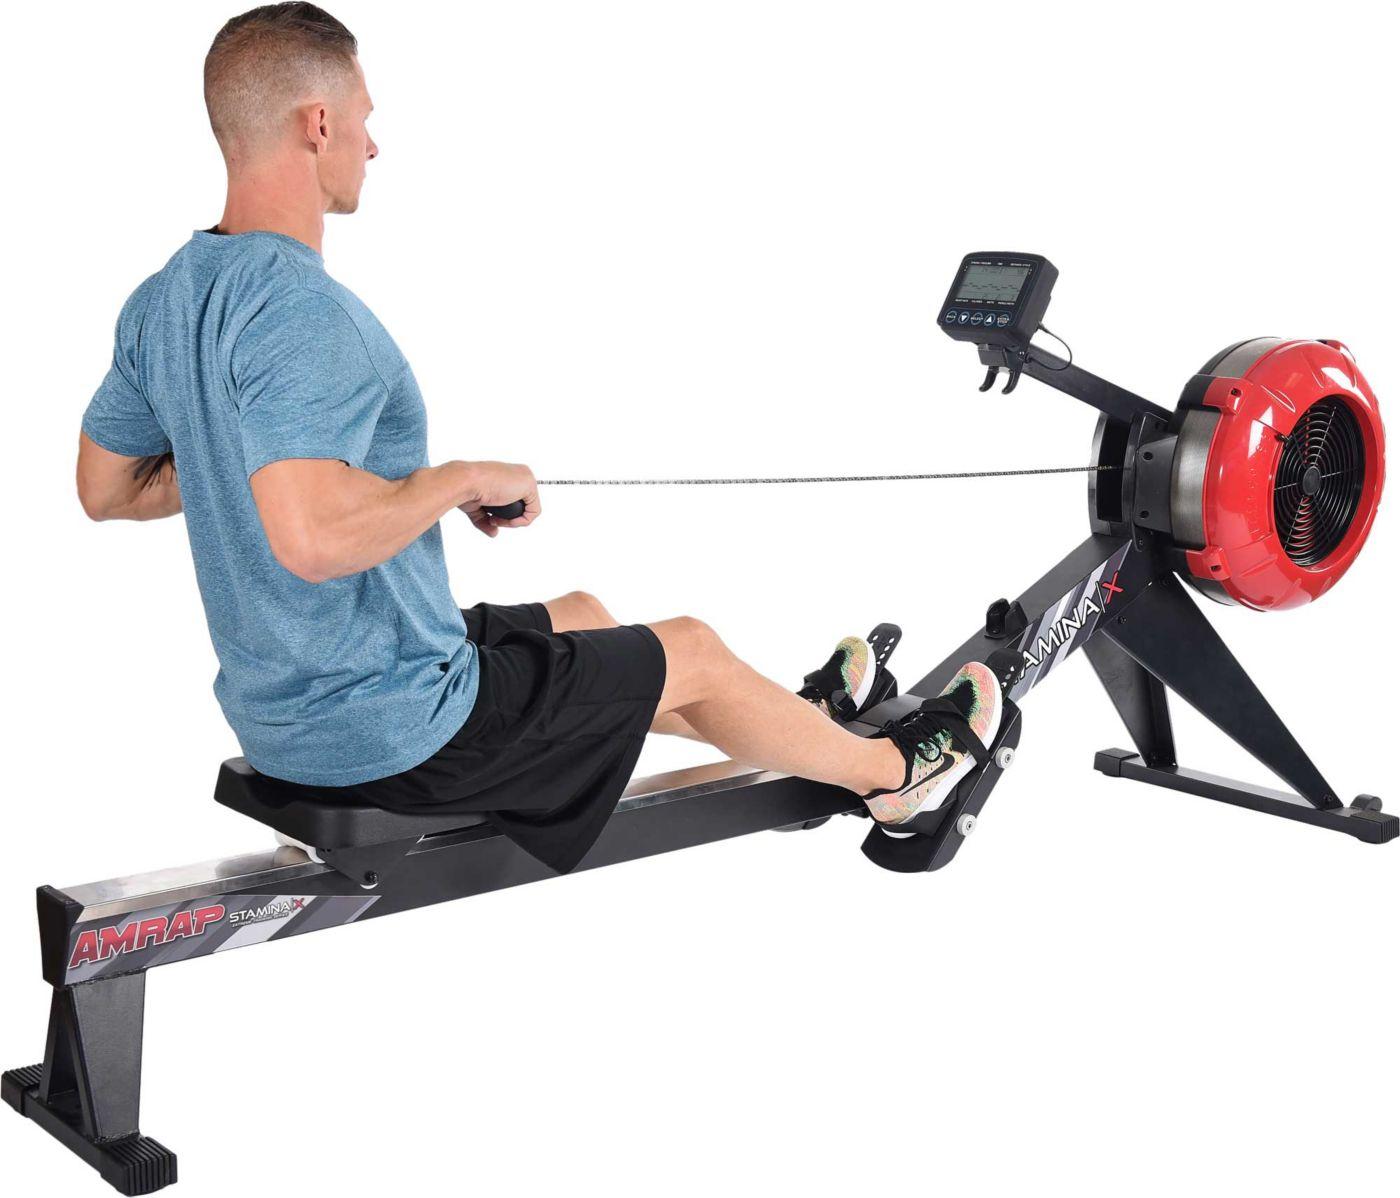 The Stamina X AMRAP Rower